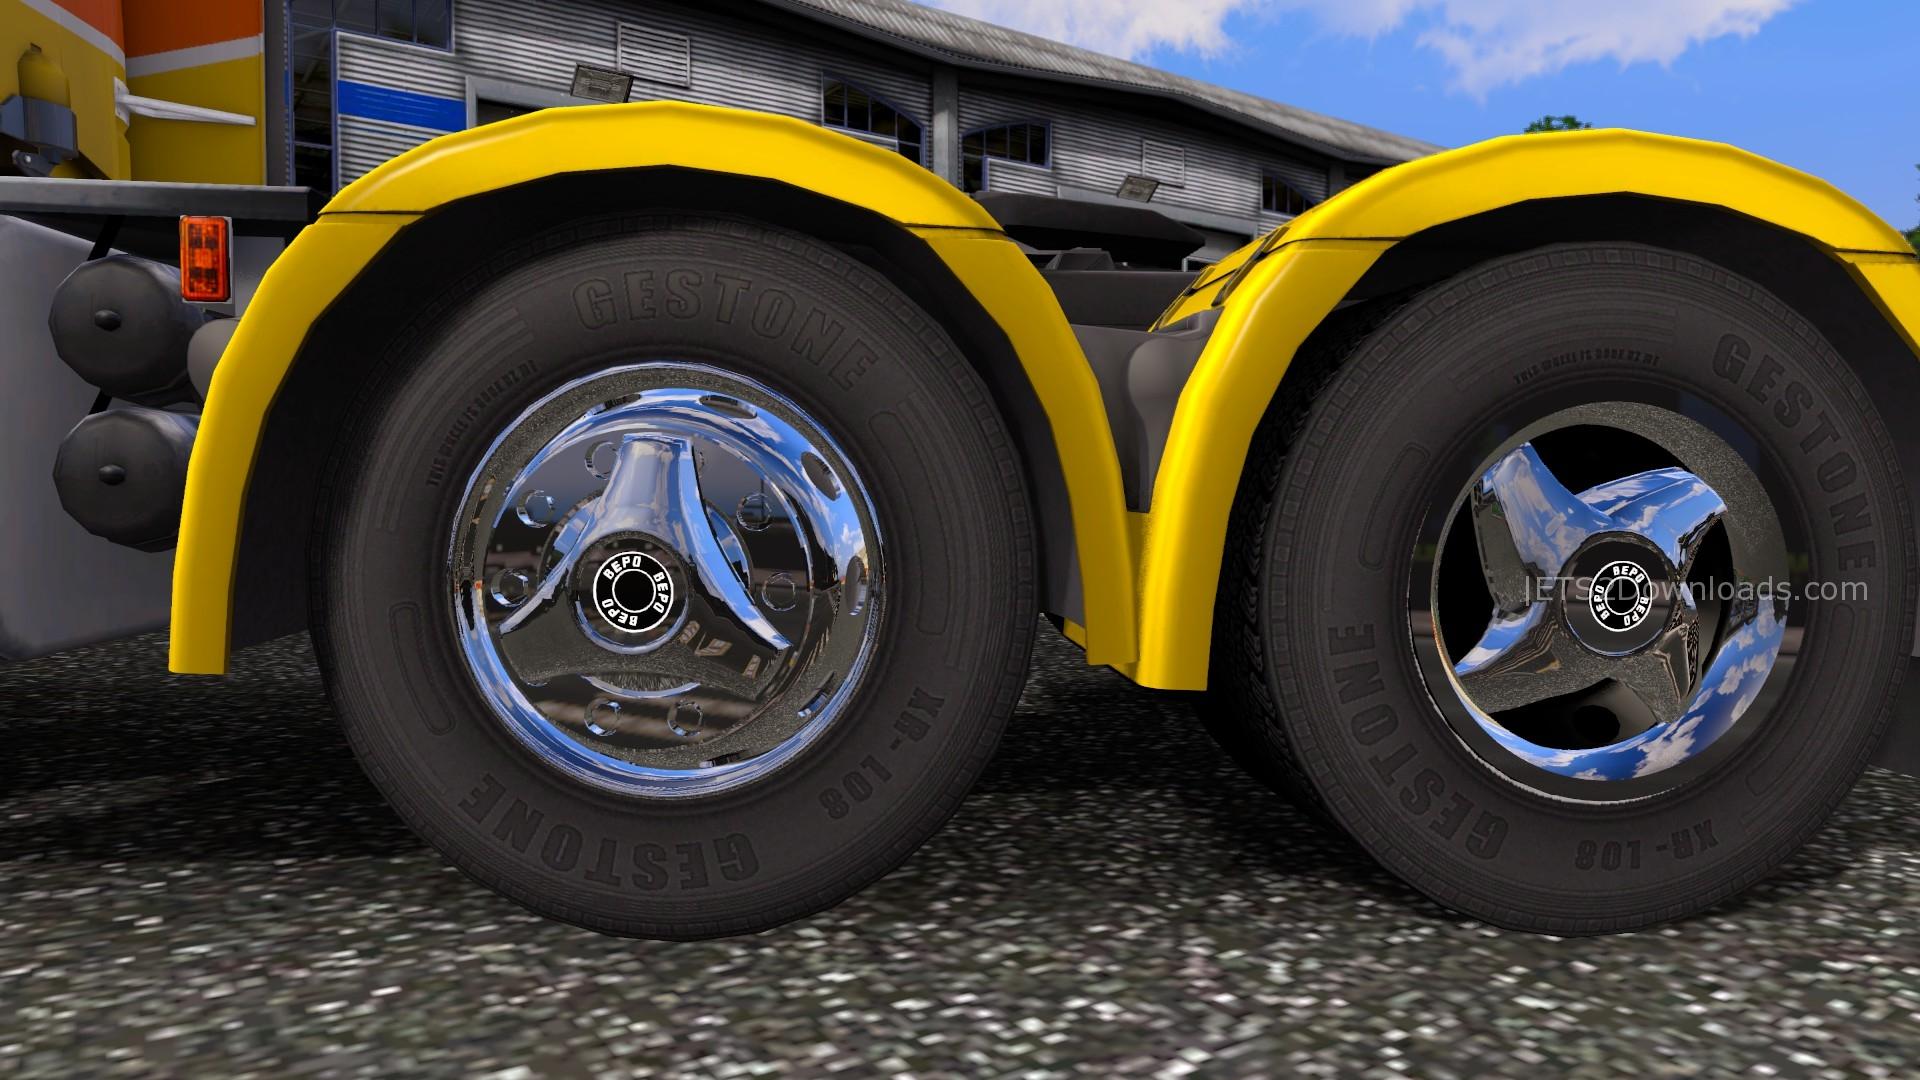 bepo-wheels-for-all-trucks